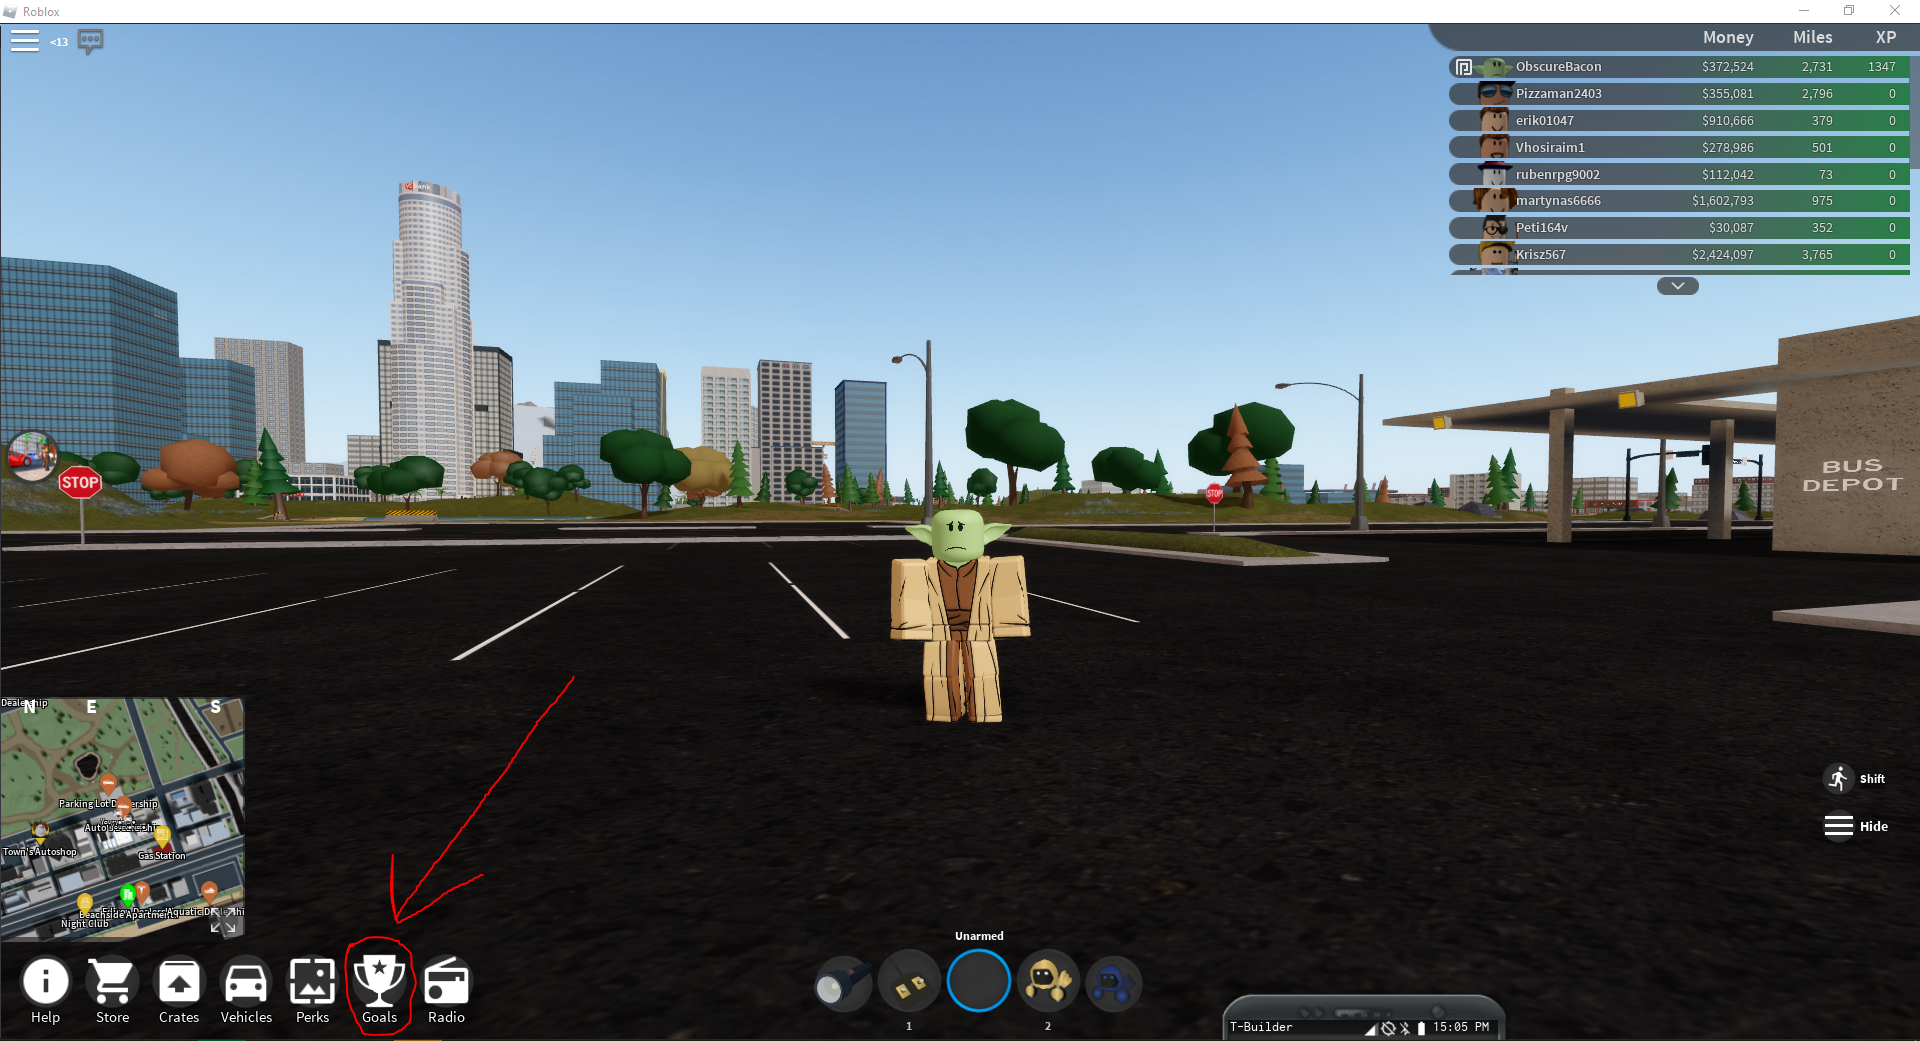 Roblox Bunker Hill Badges Goals Achivements Roblox Vehicle Simulator Wiki Fandom